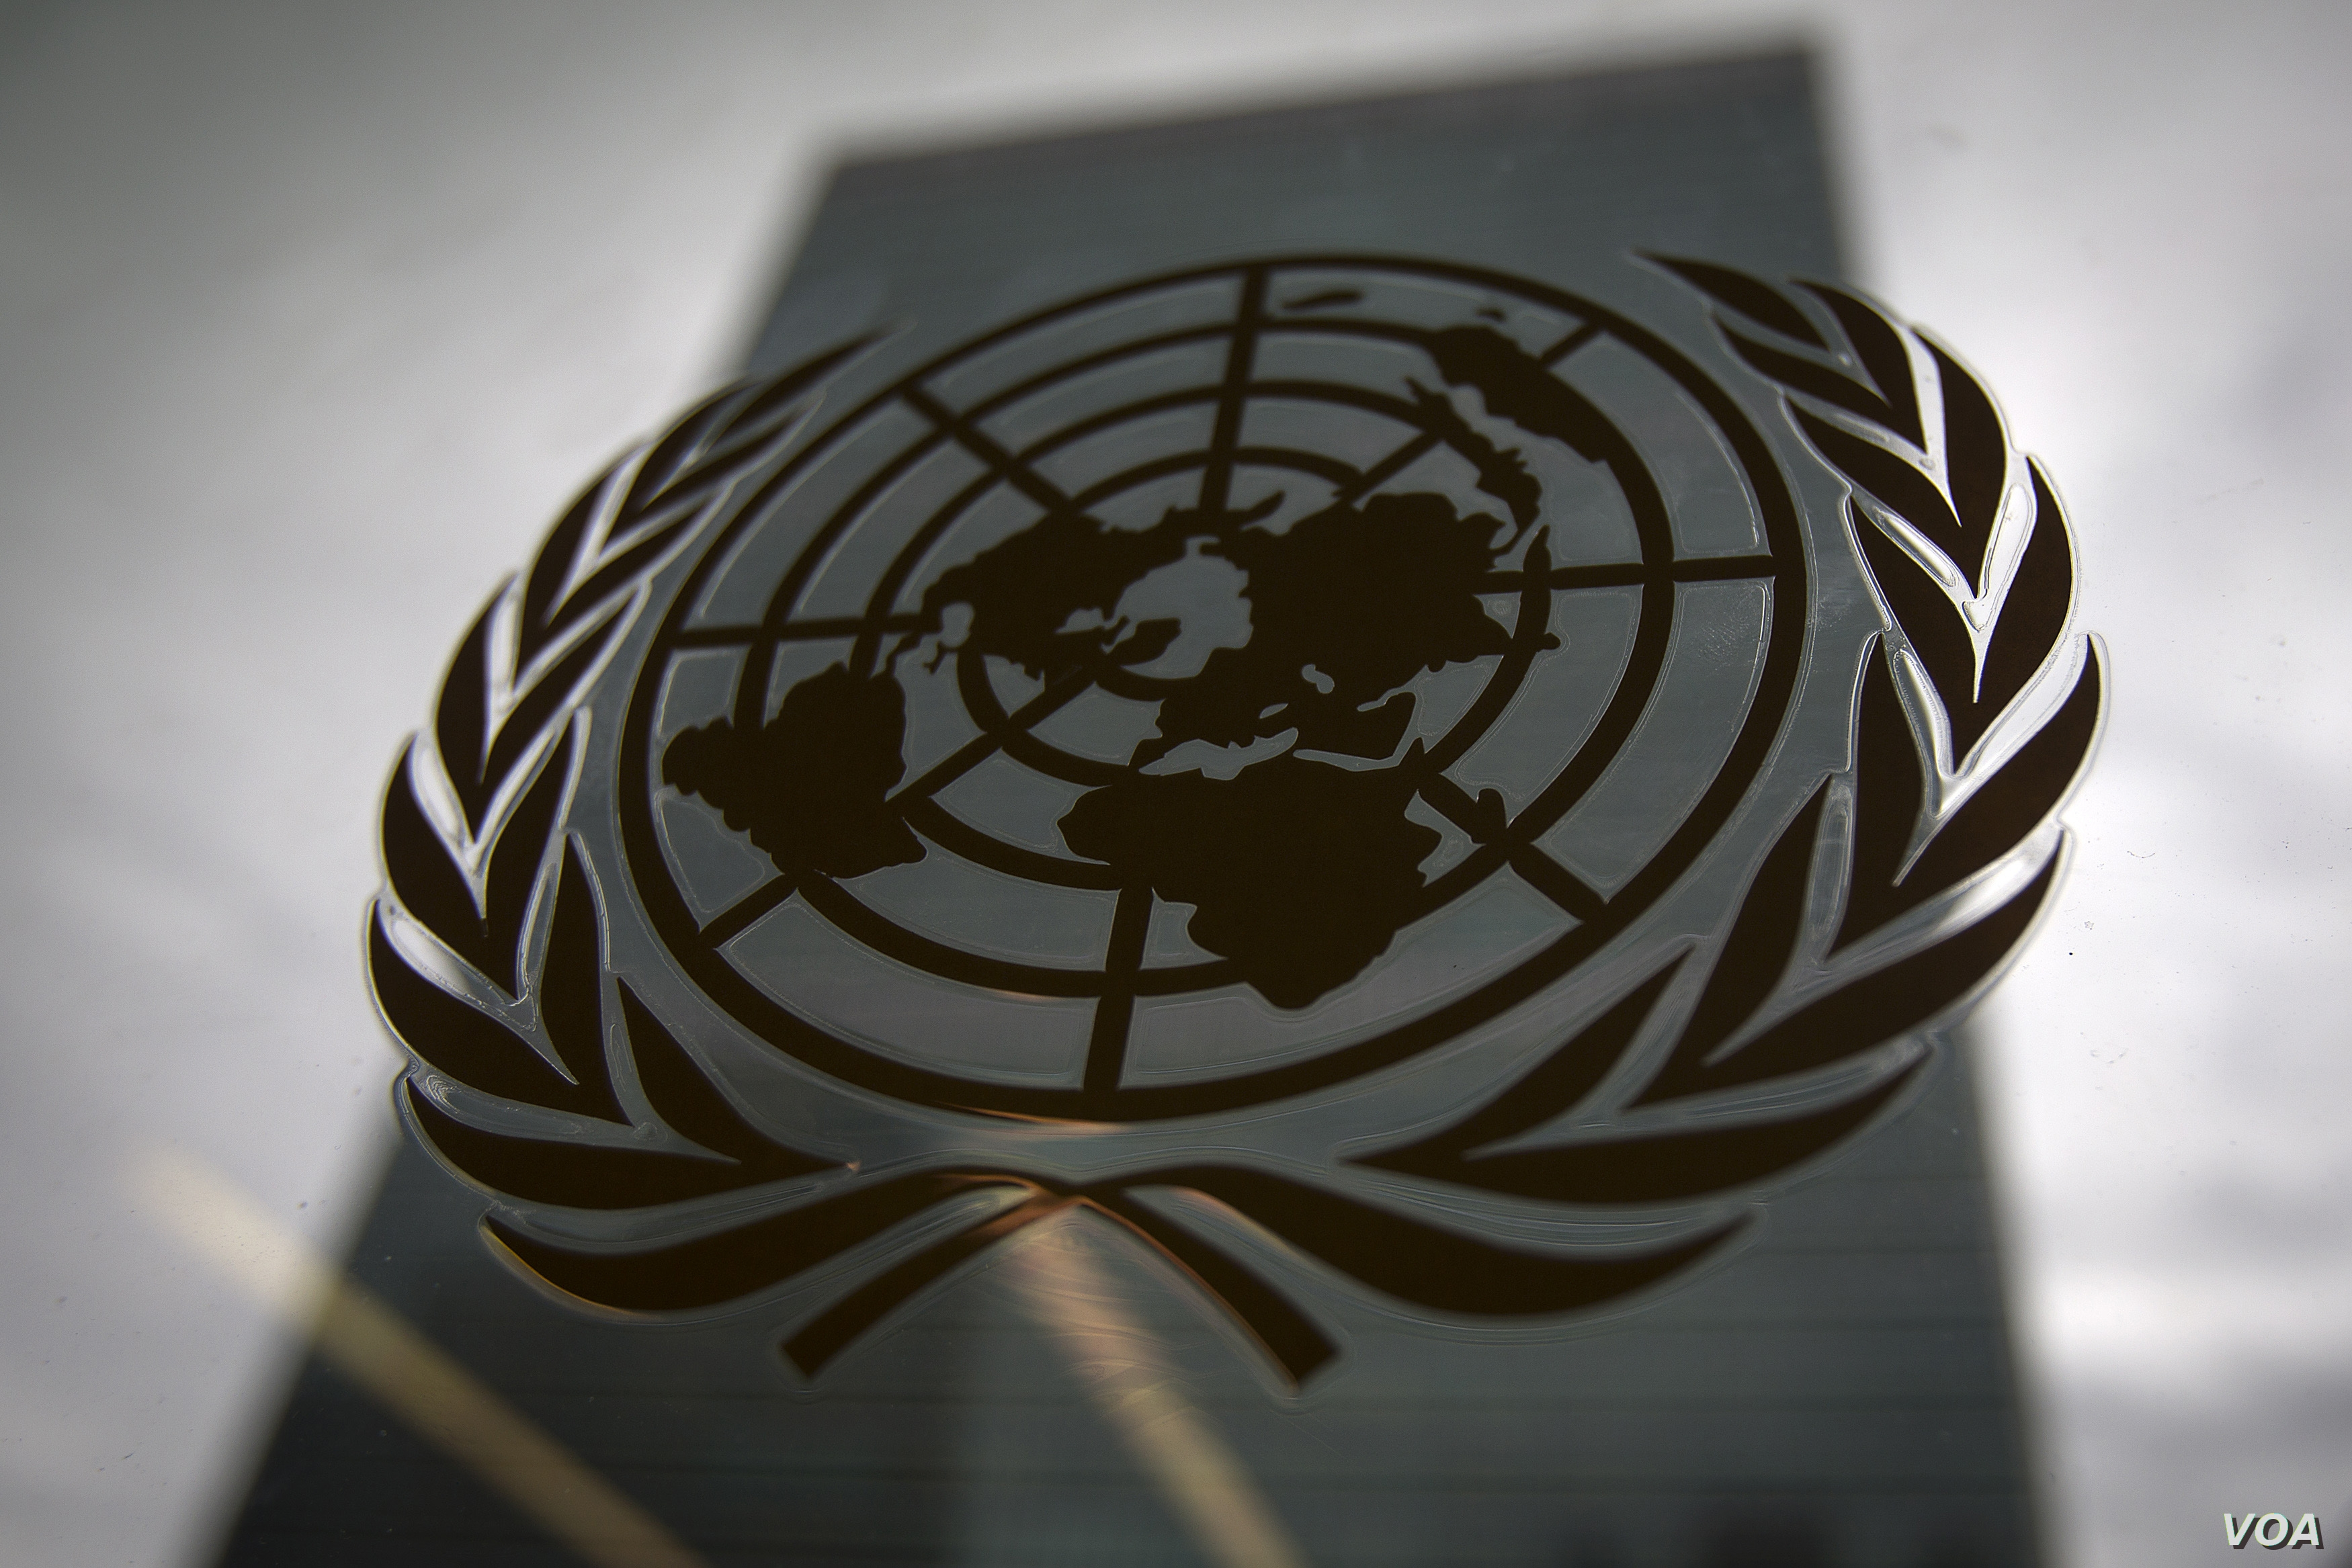 ООН подверглась кибератаке